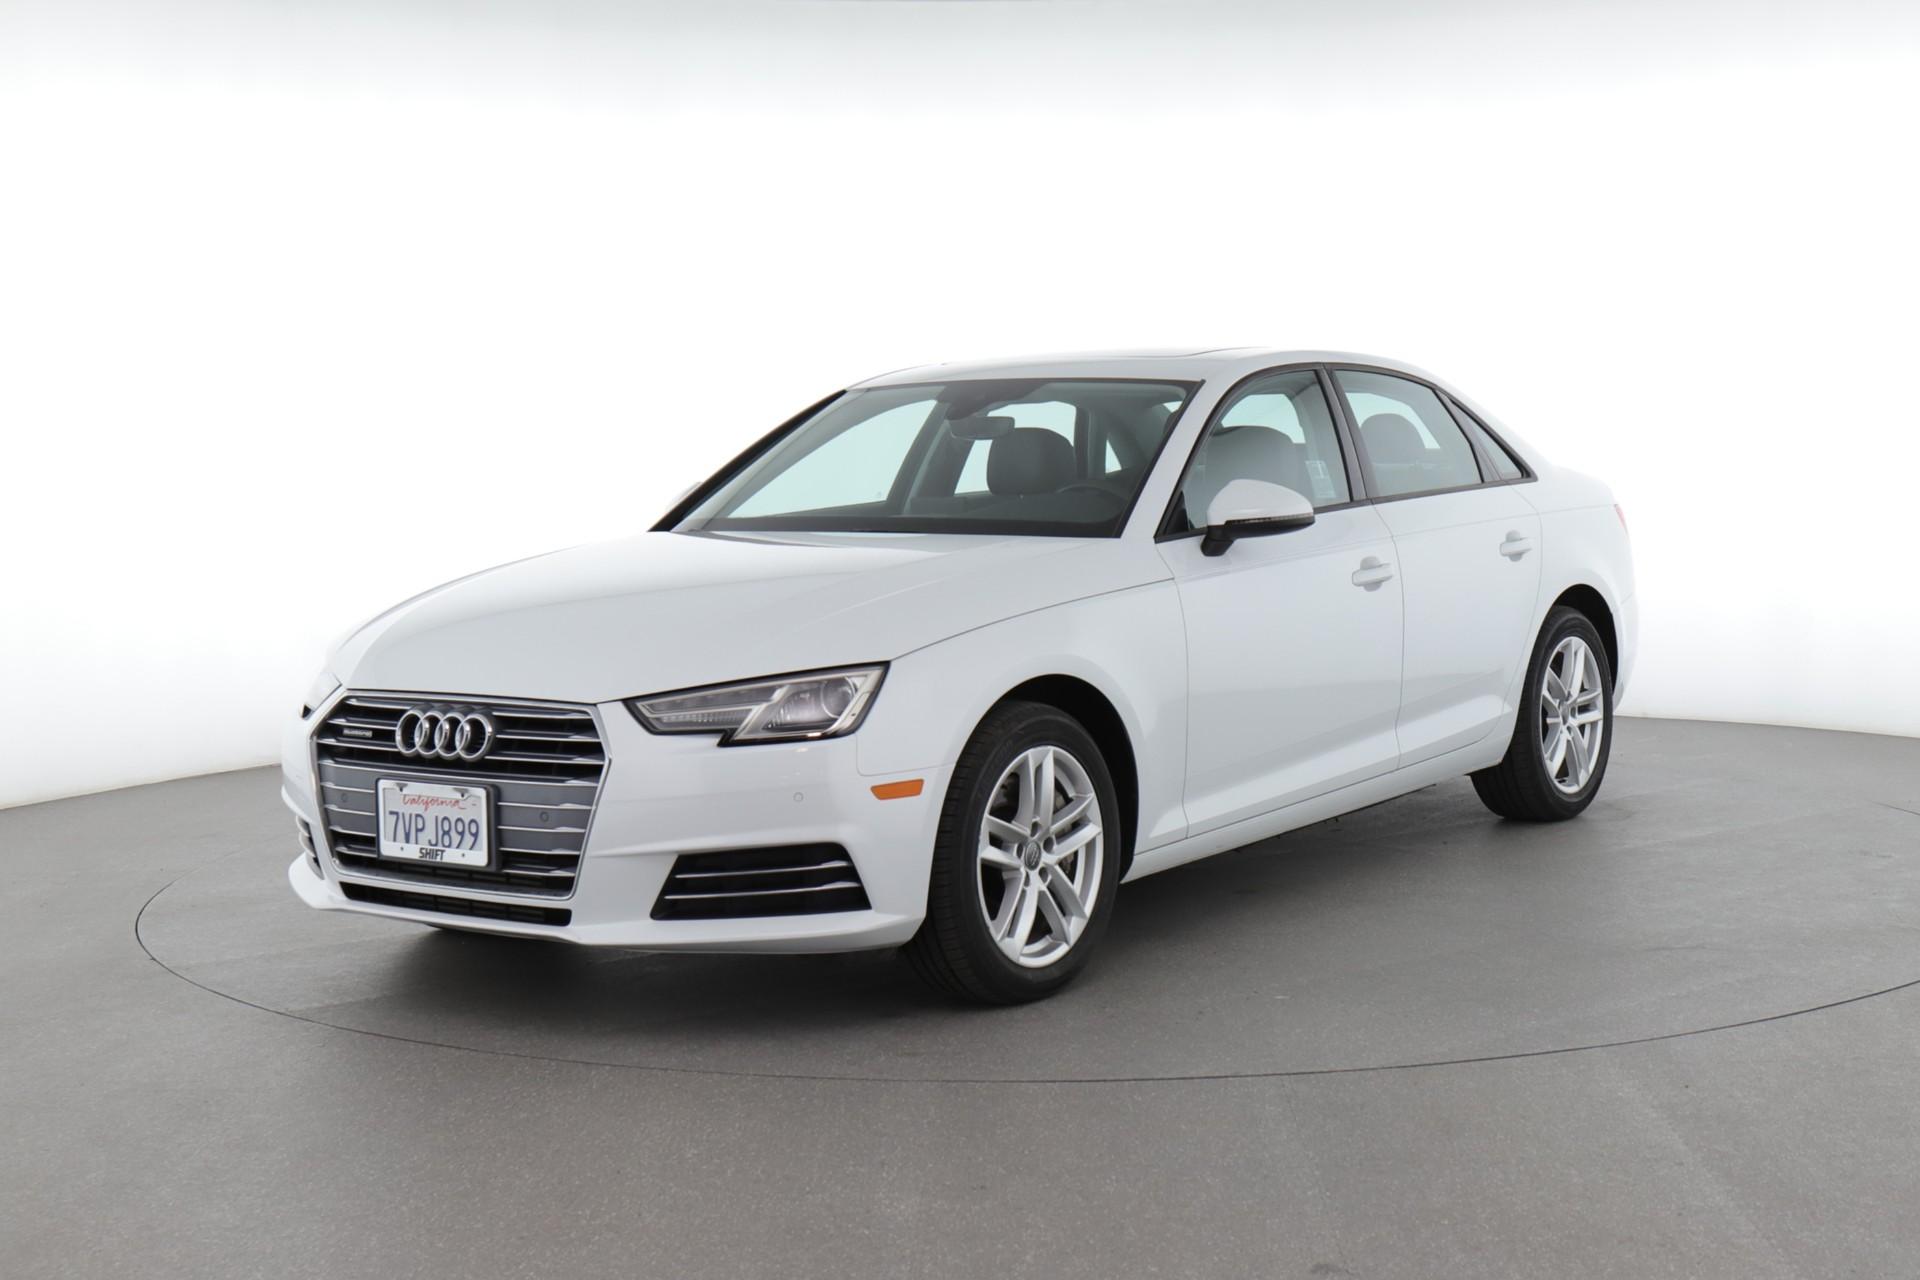 2017 Audi A4 Premium (from $26,500)